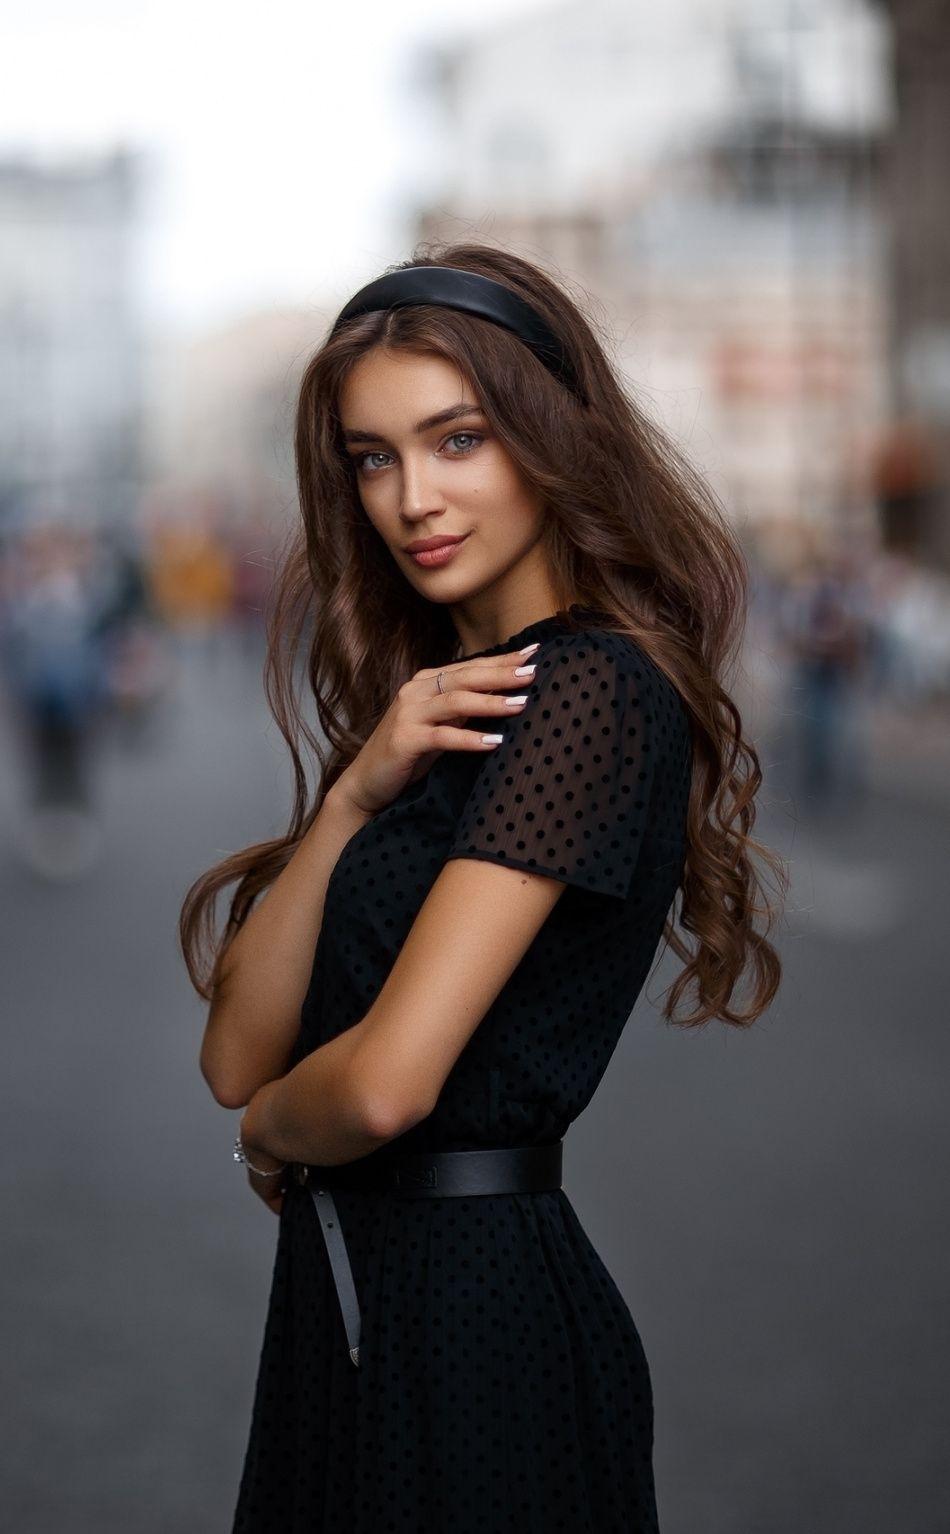 950x1534 Black Dress Pretty Long Hair Woman Model Wallpaper Long Hair Styles Women Beautiful Women Faces [ 1534 x 950 Pixel ]